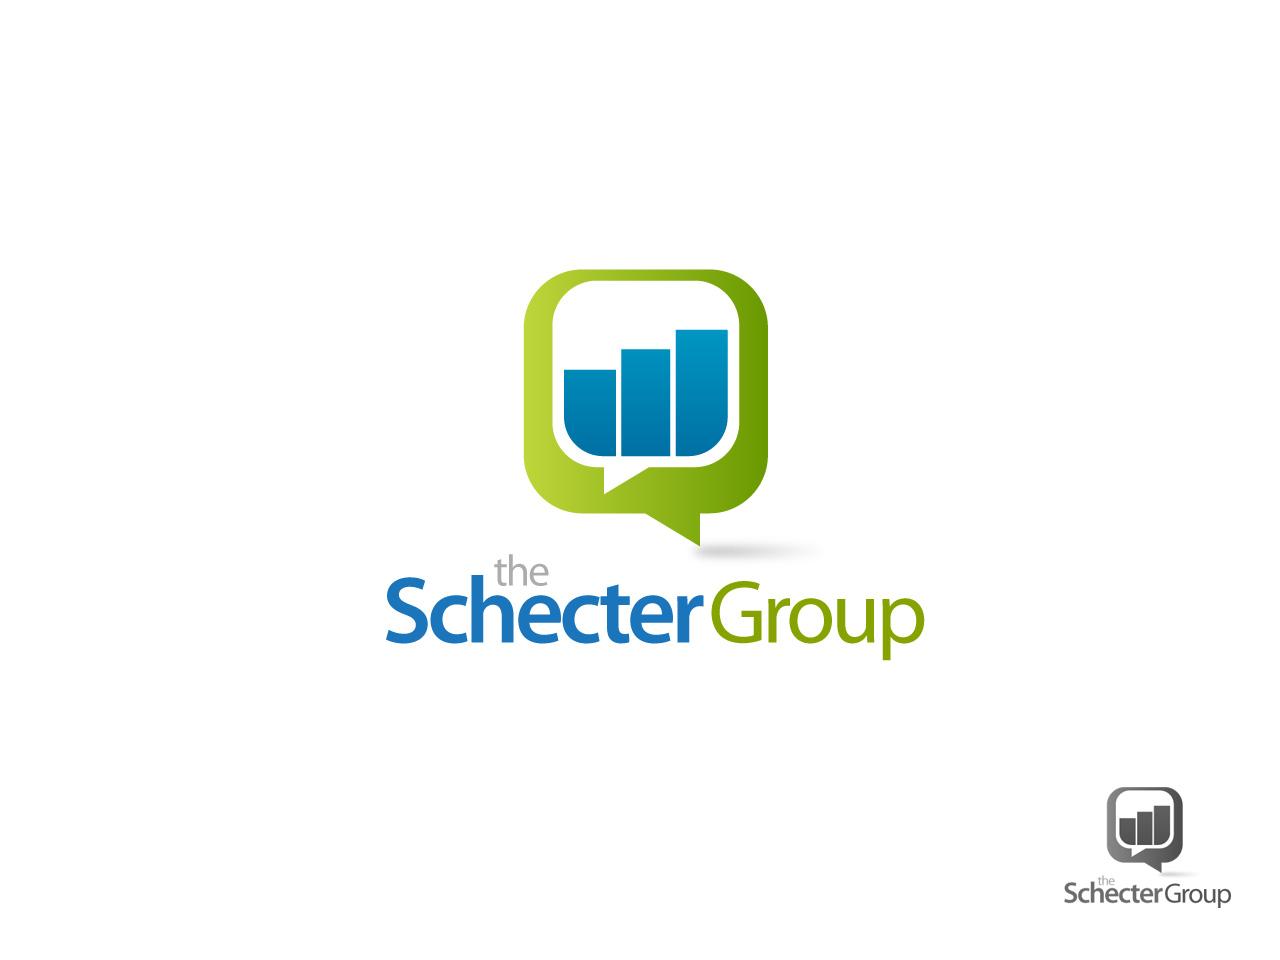 Logo Design by jpbituin - Entry No. 93 in the Logo Design Contest Inspiring Logo Design for The Schecter Group.